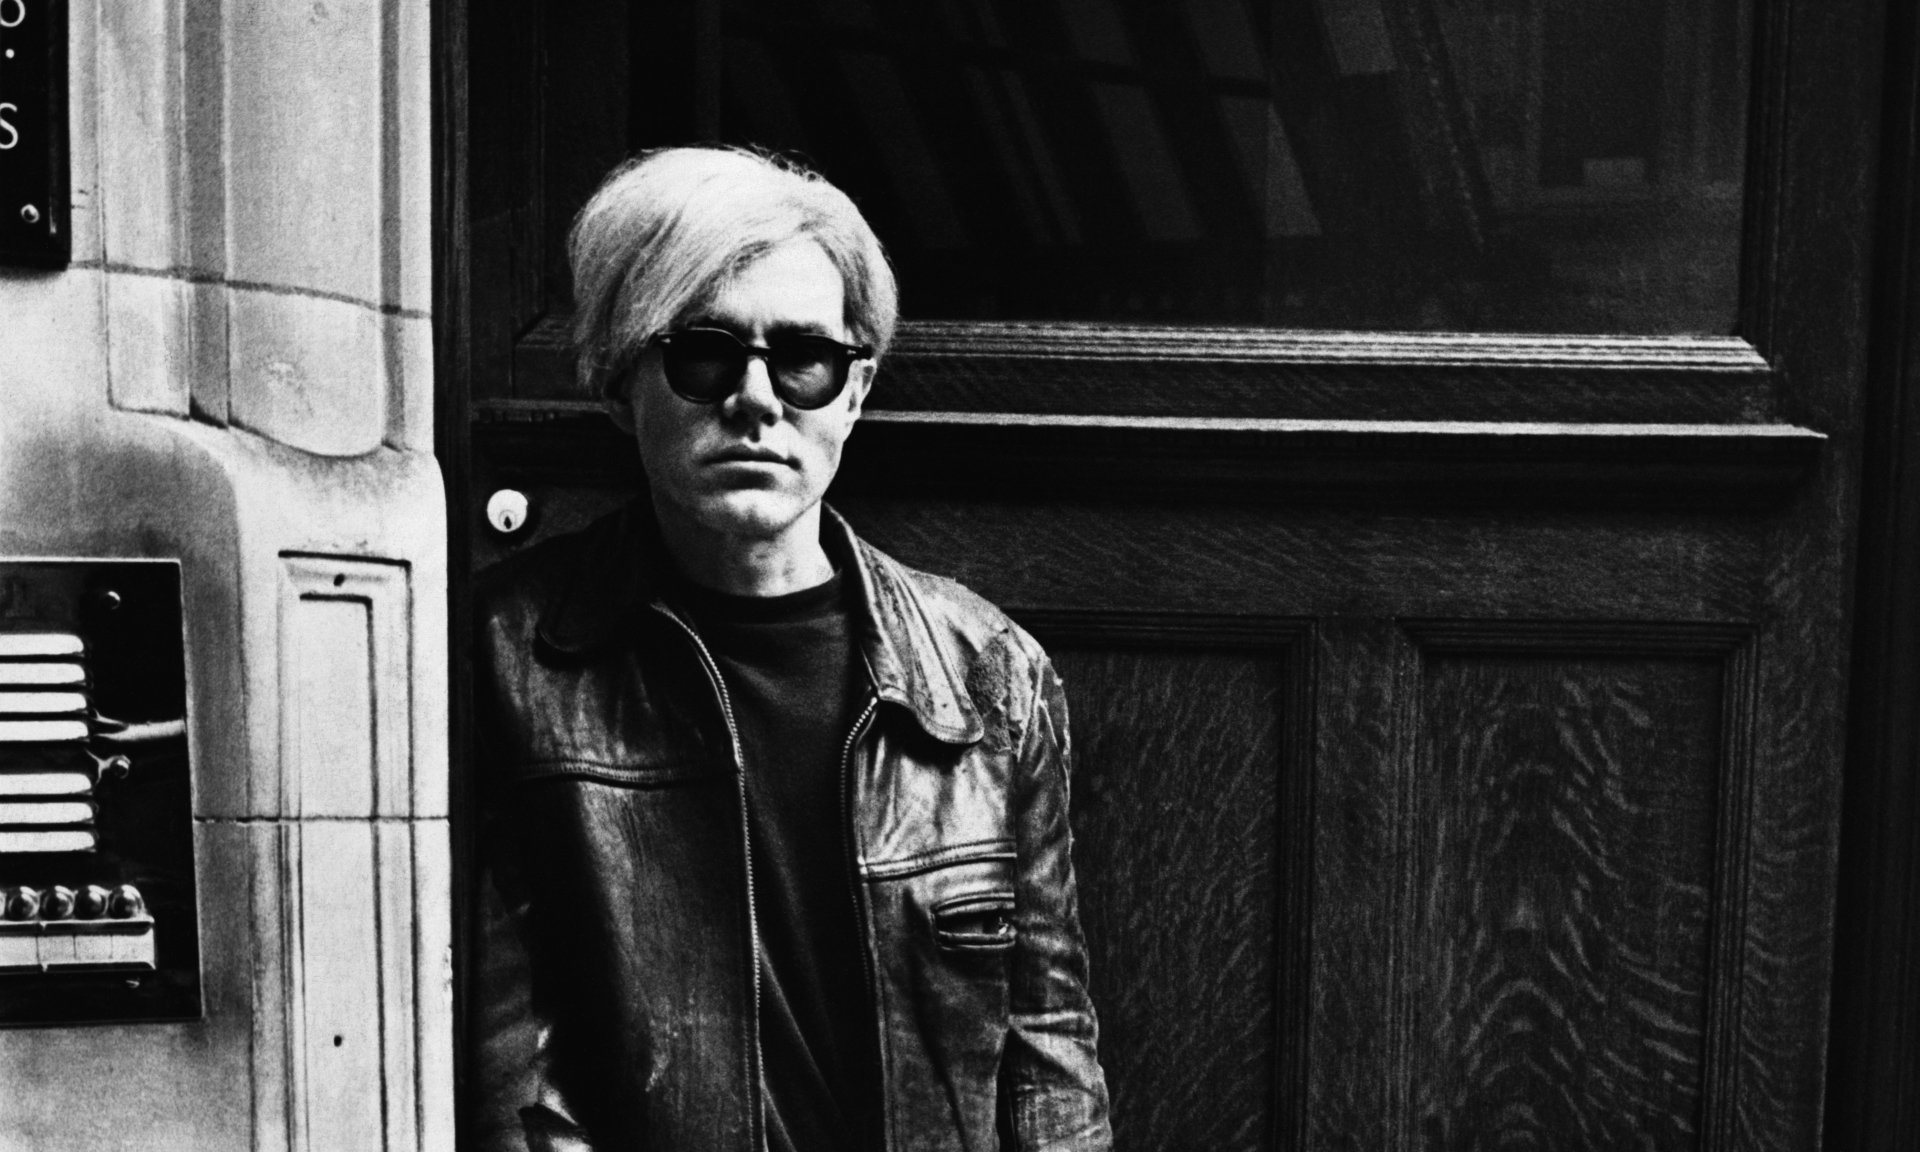 Men - Andy Warhol  Wallpaper